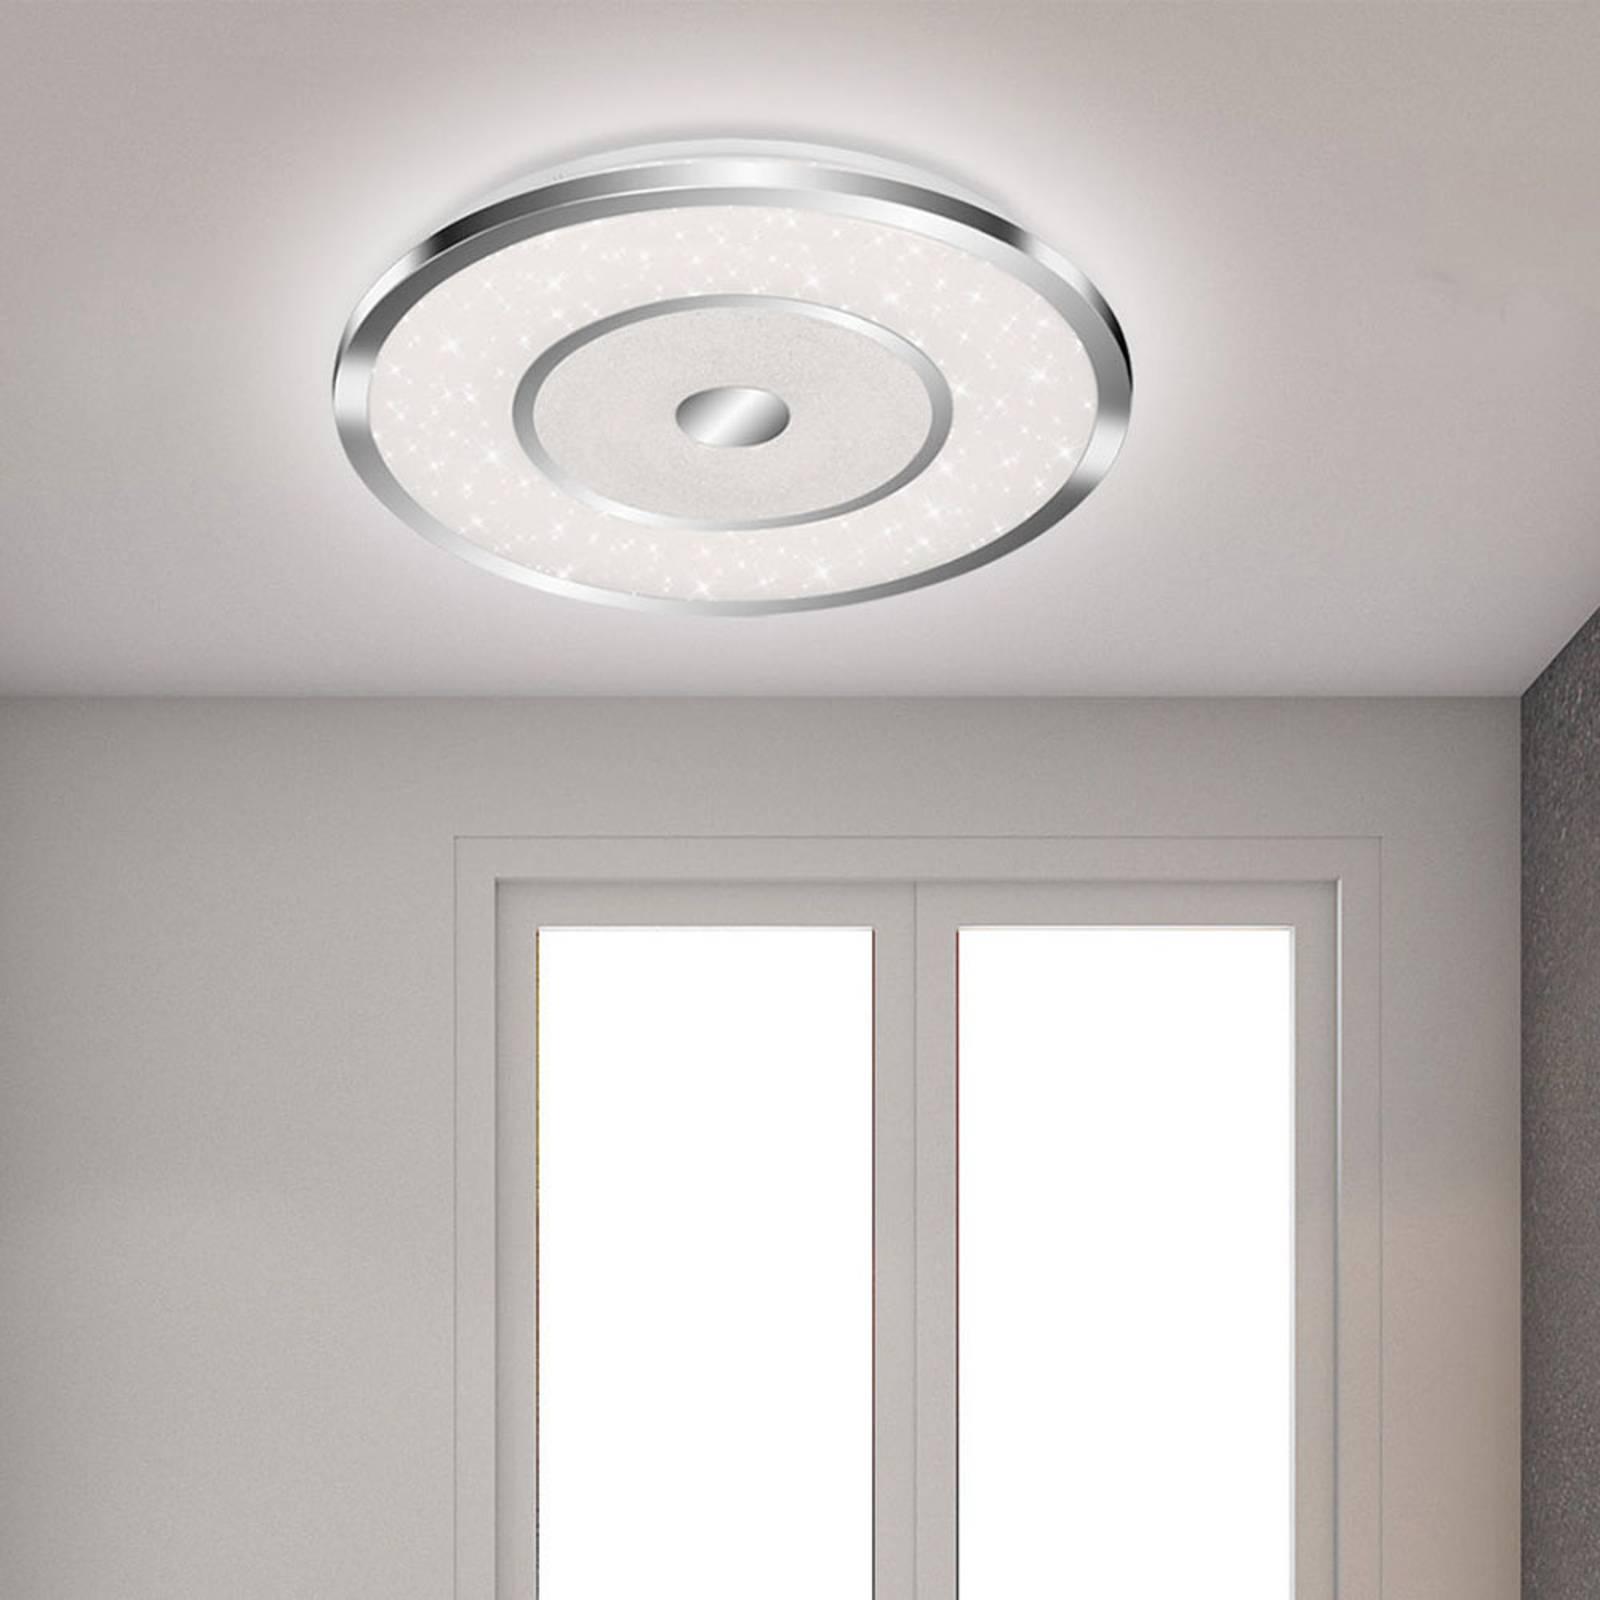 Lampa sufitowa LED Spaco CCT z pilotem